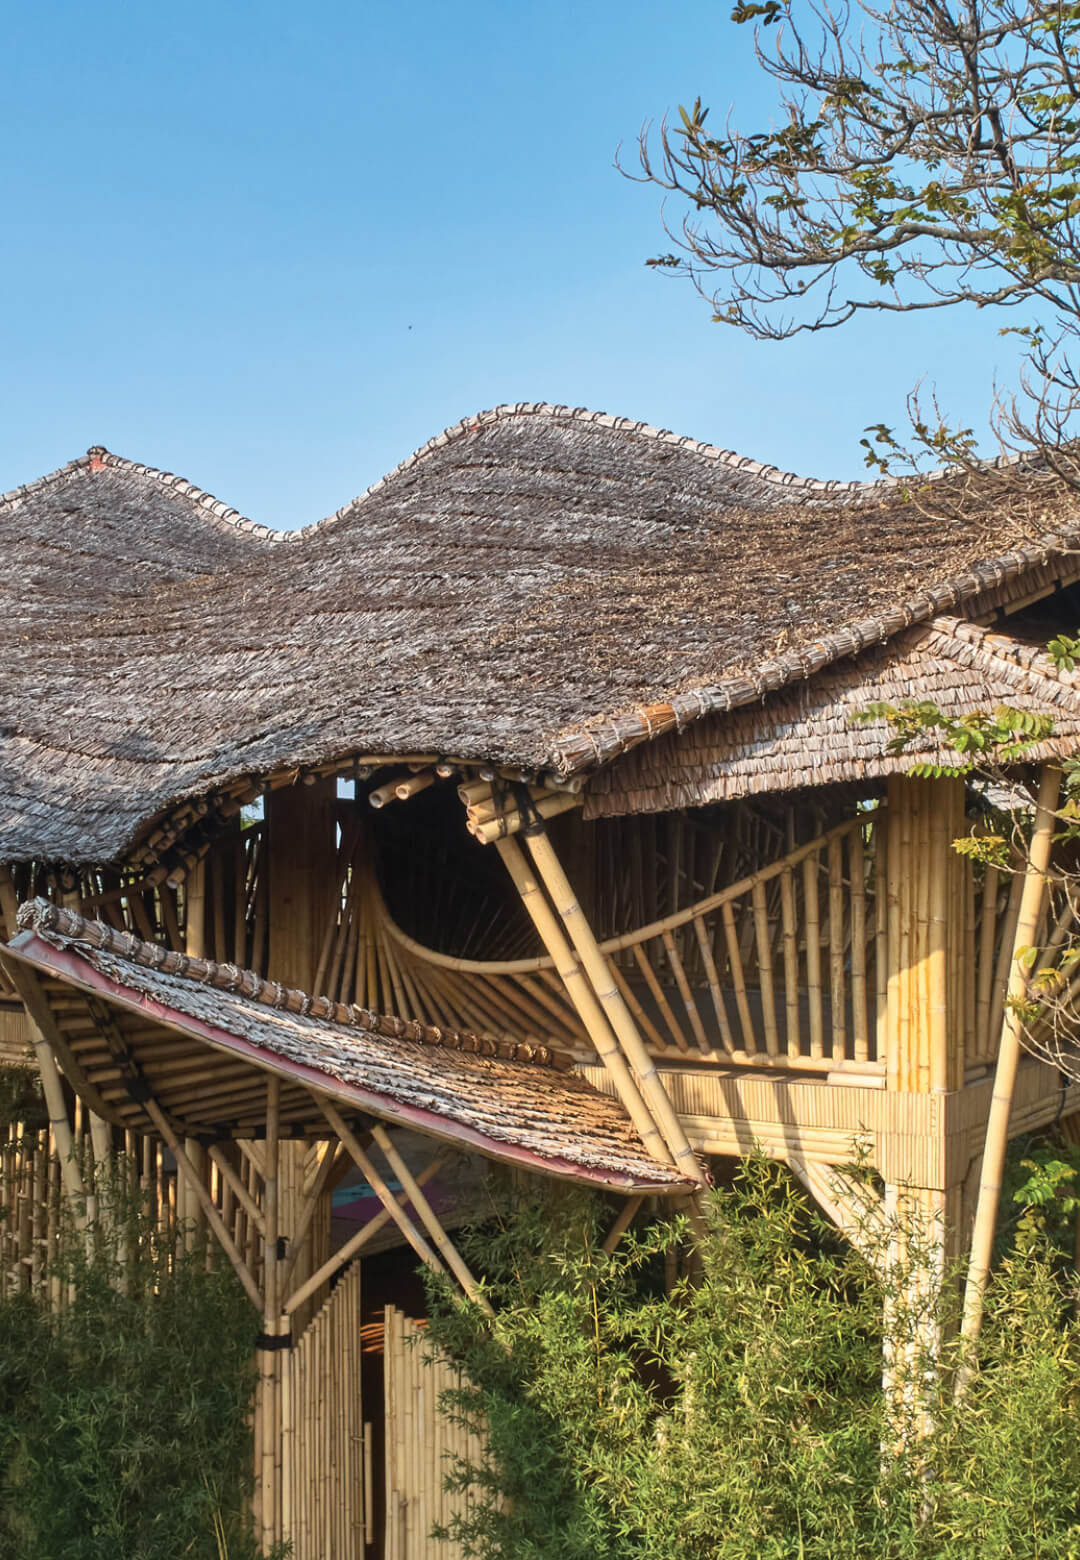 The artisan workshop and Kujang hall at Piyandeling | Piyandeling | Realrich Architecture Workshop (RAW) | STIRworld